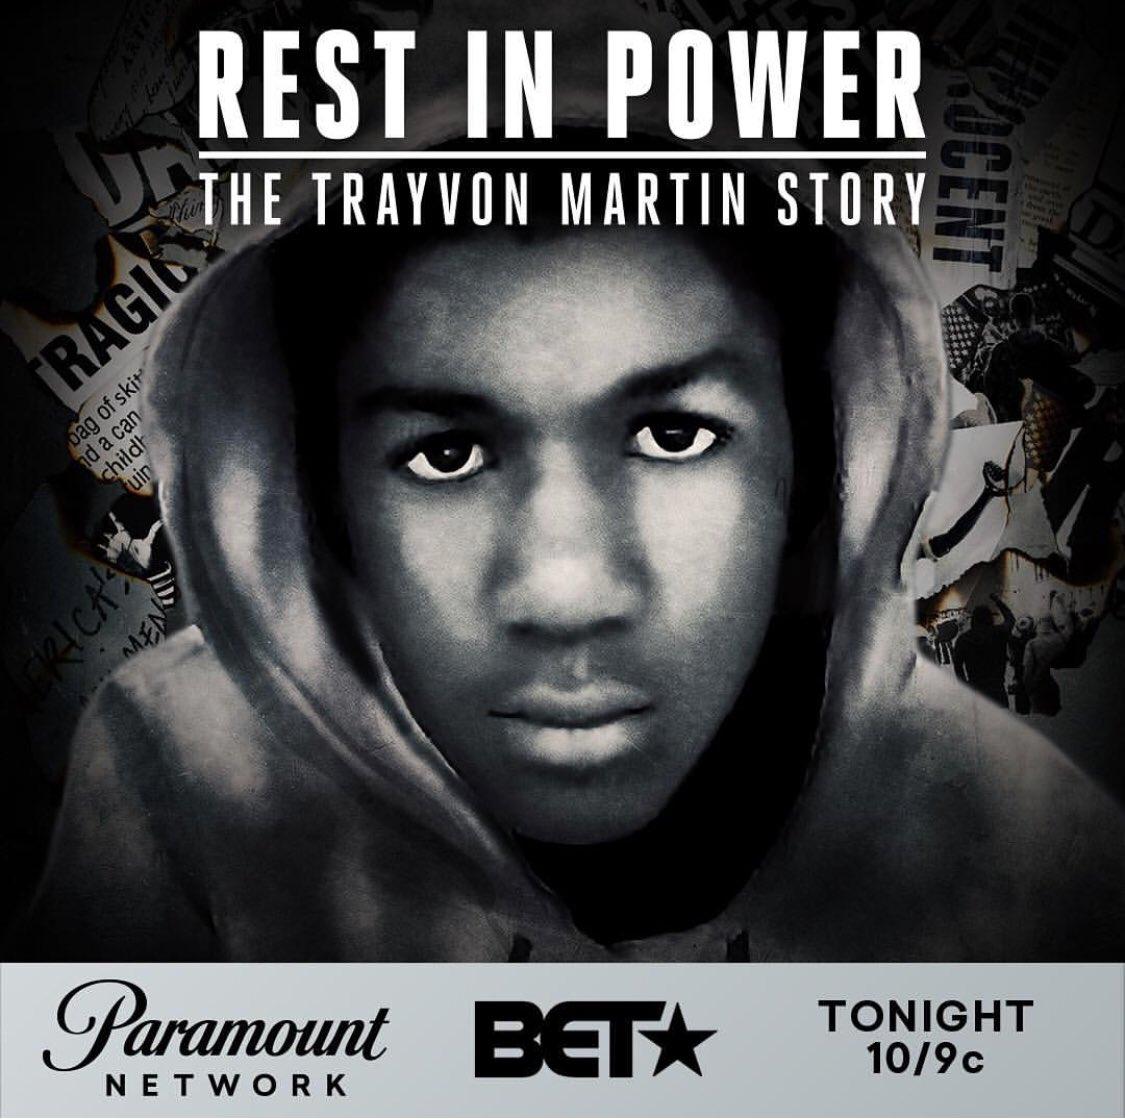 trayvon martin story on bet